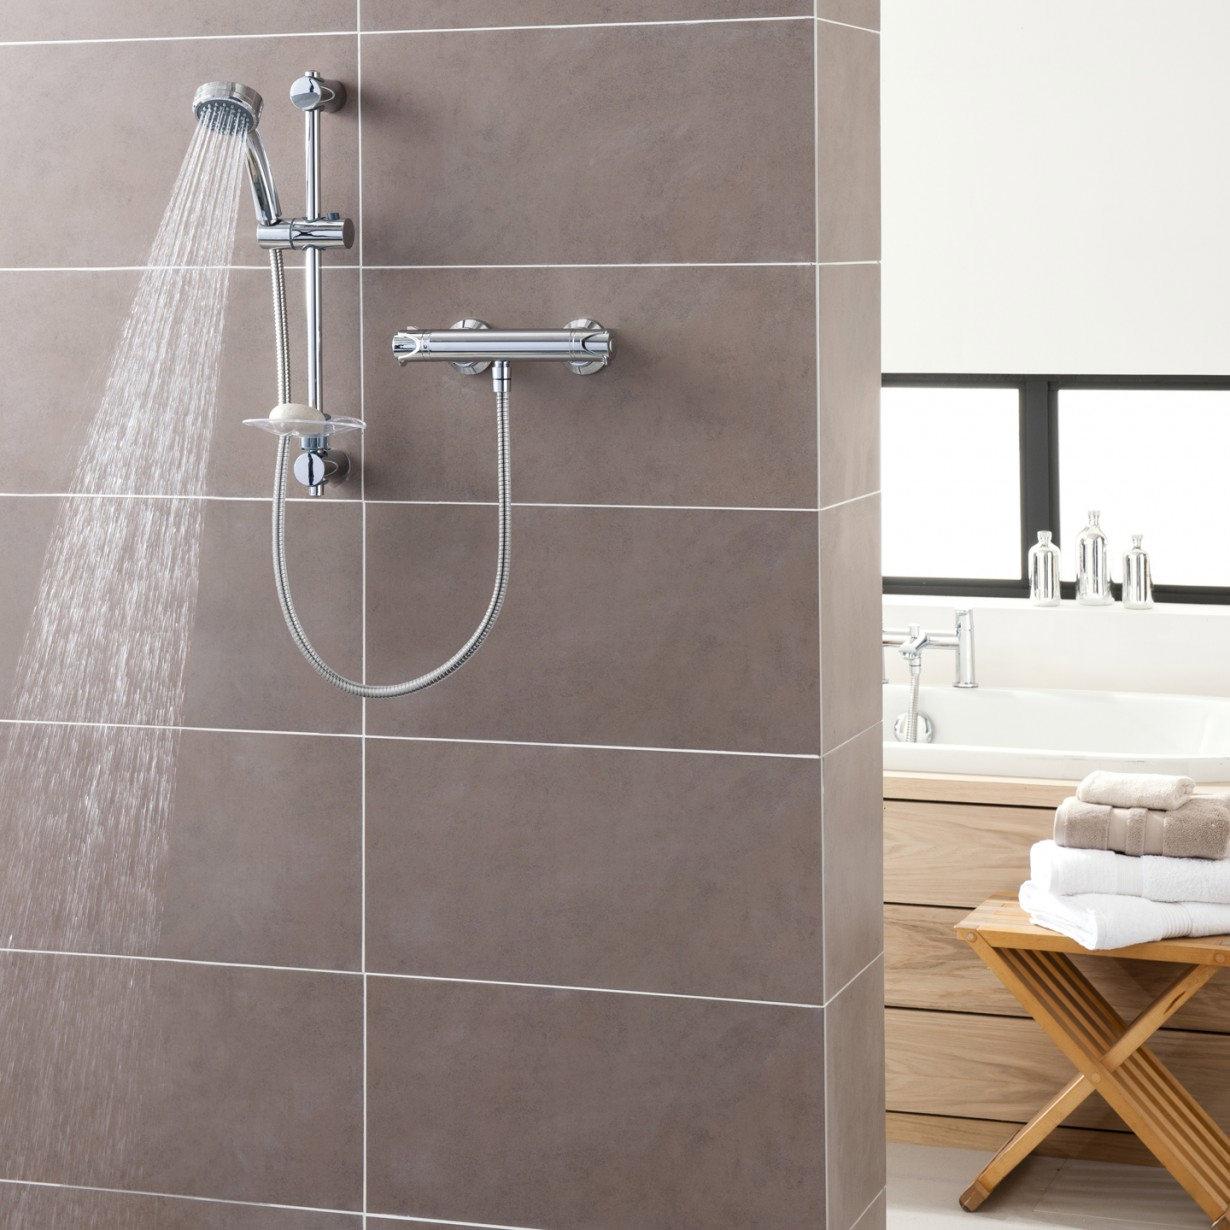 Top Rated Granite Kitchen Sinks